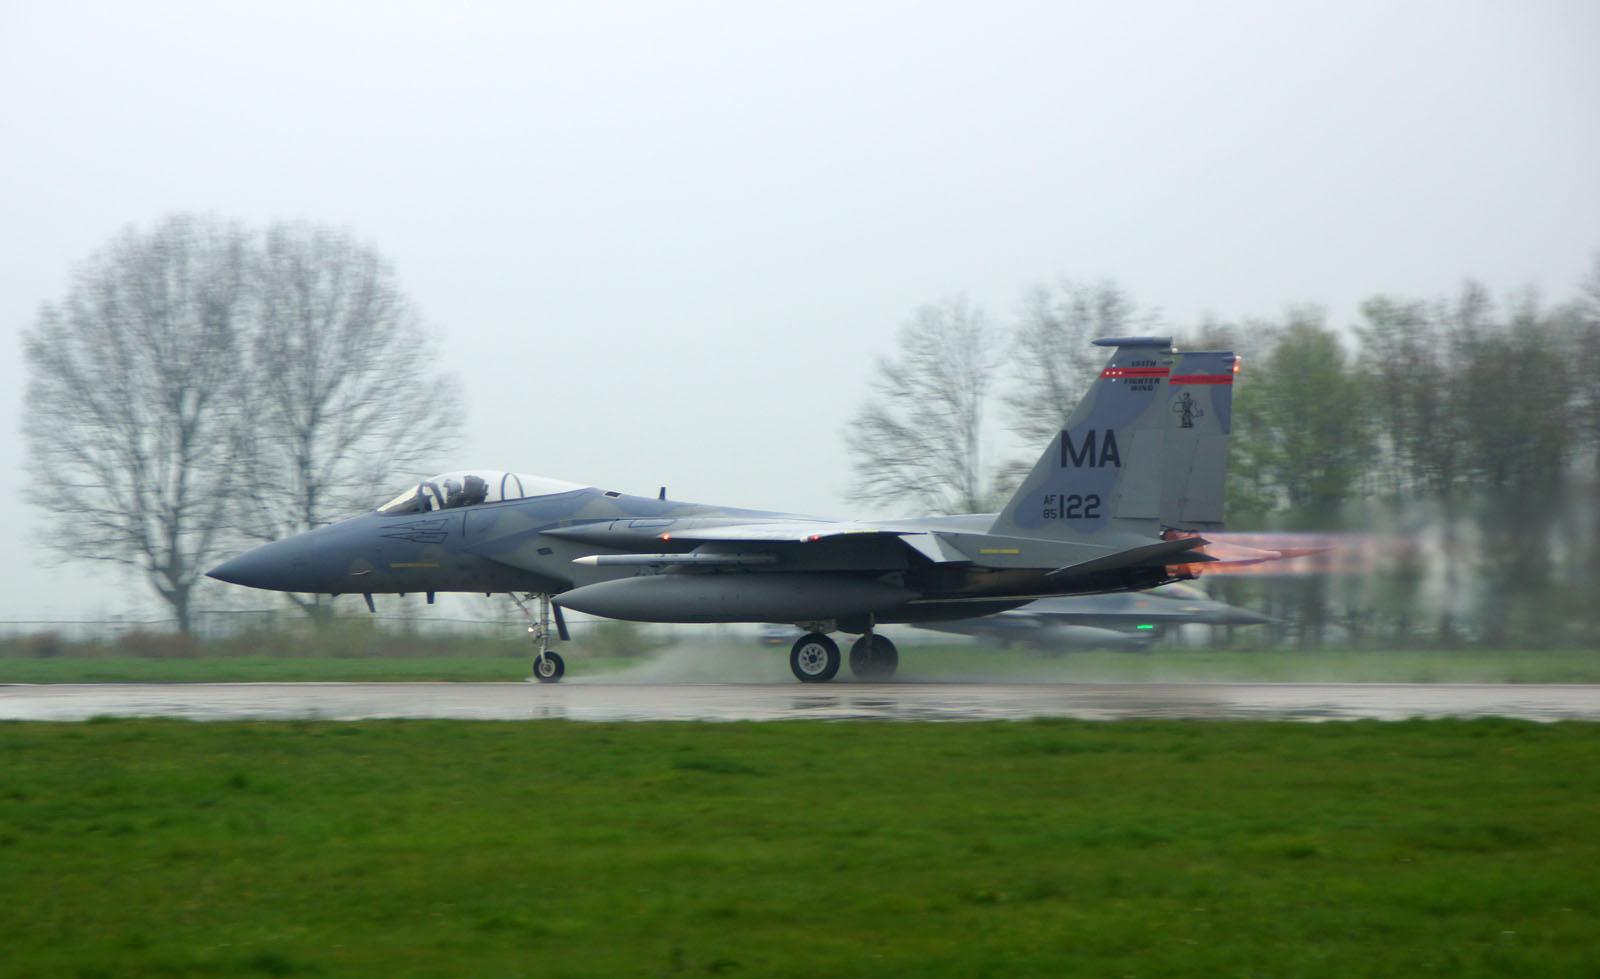 McDonnell Douglas F-15C Eagle 85-0122 MA USAF